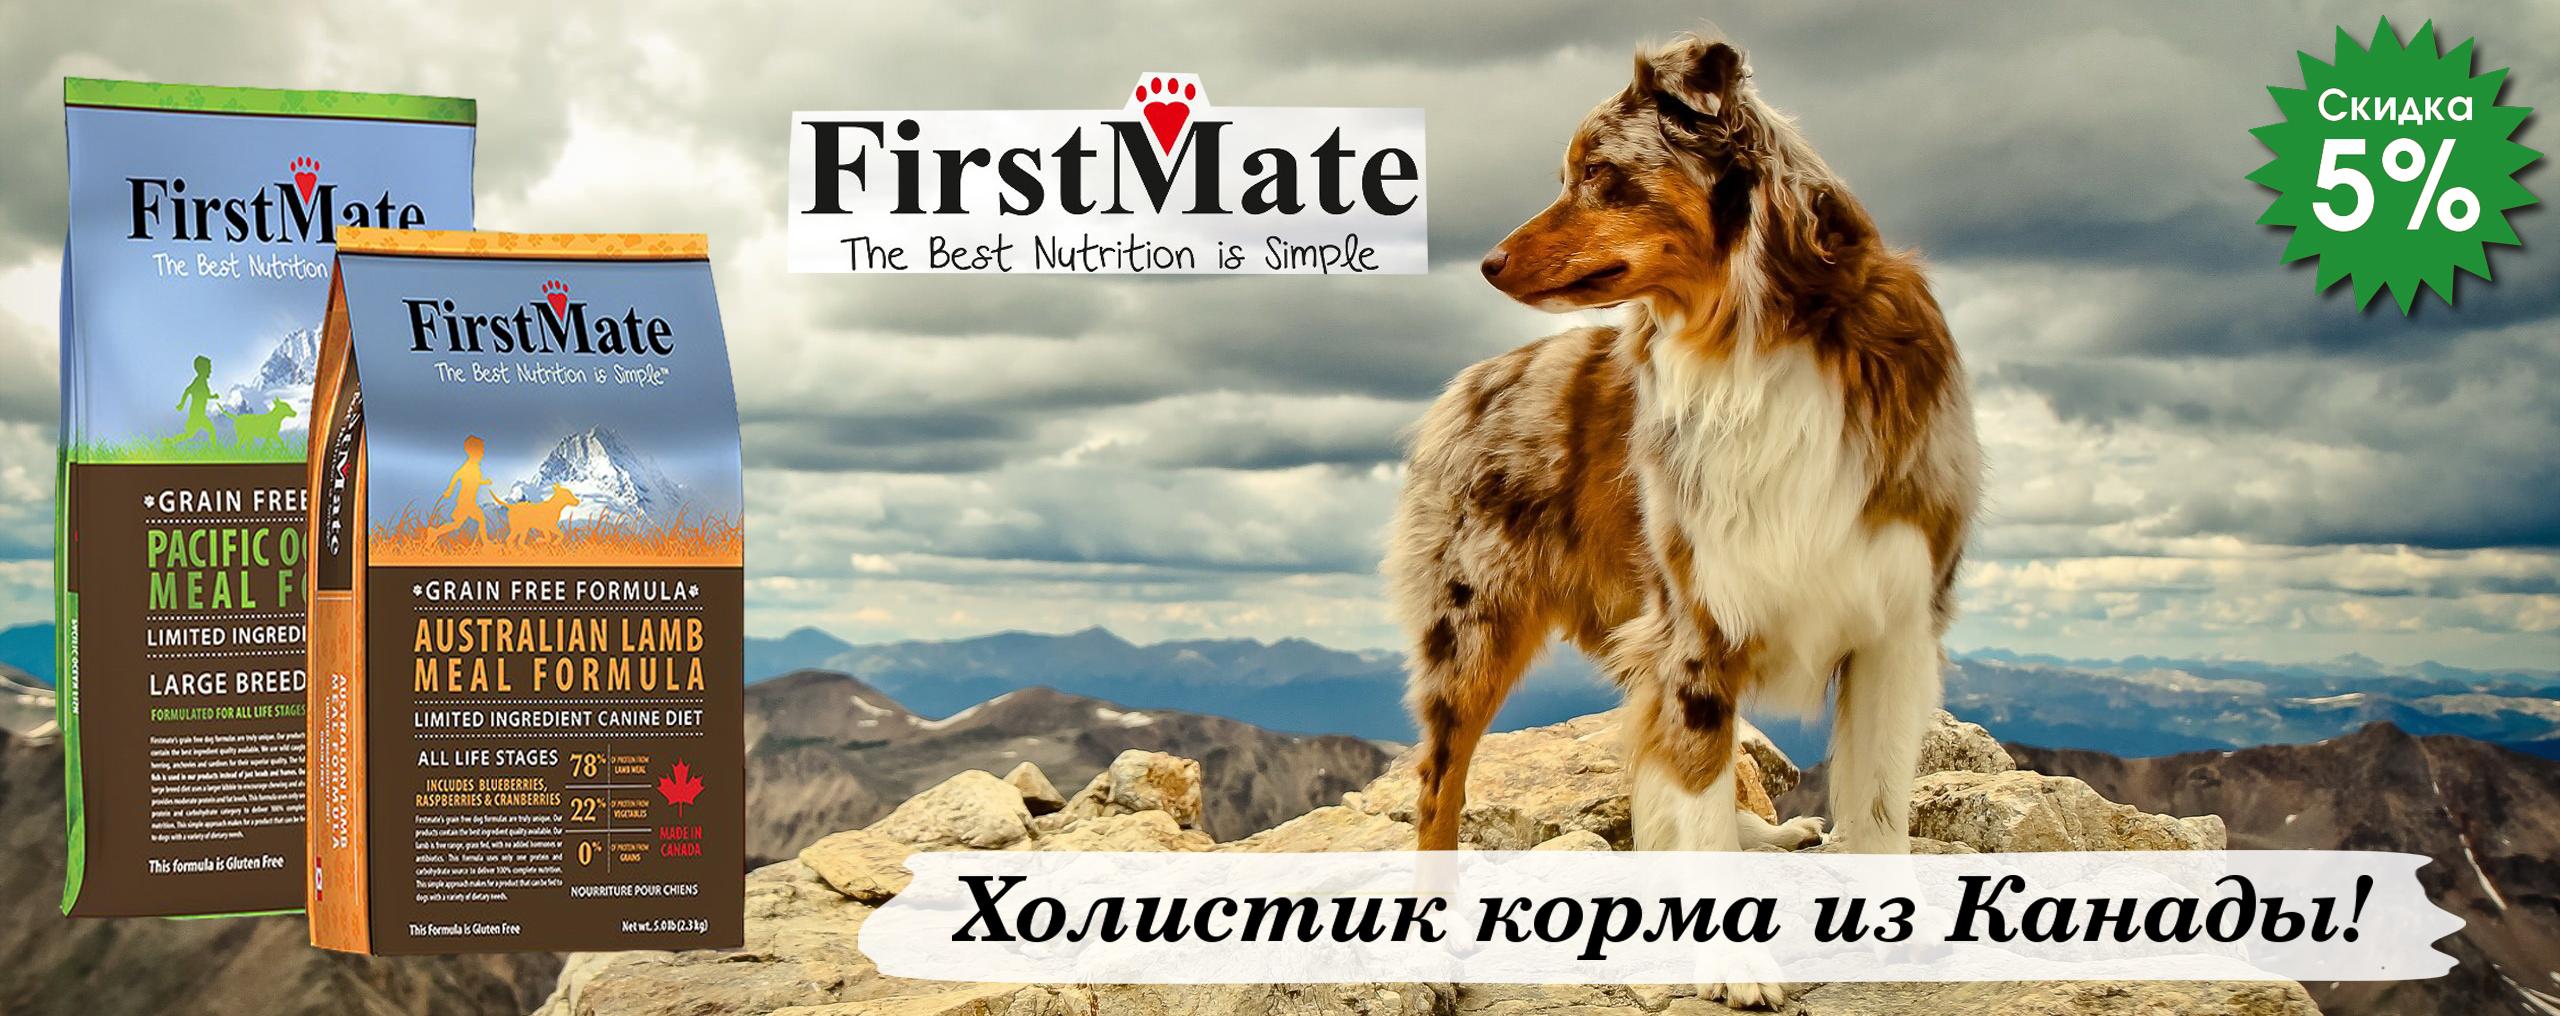 Скидка 5% на корм FirstMate